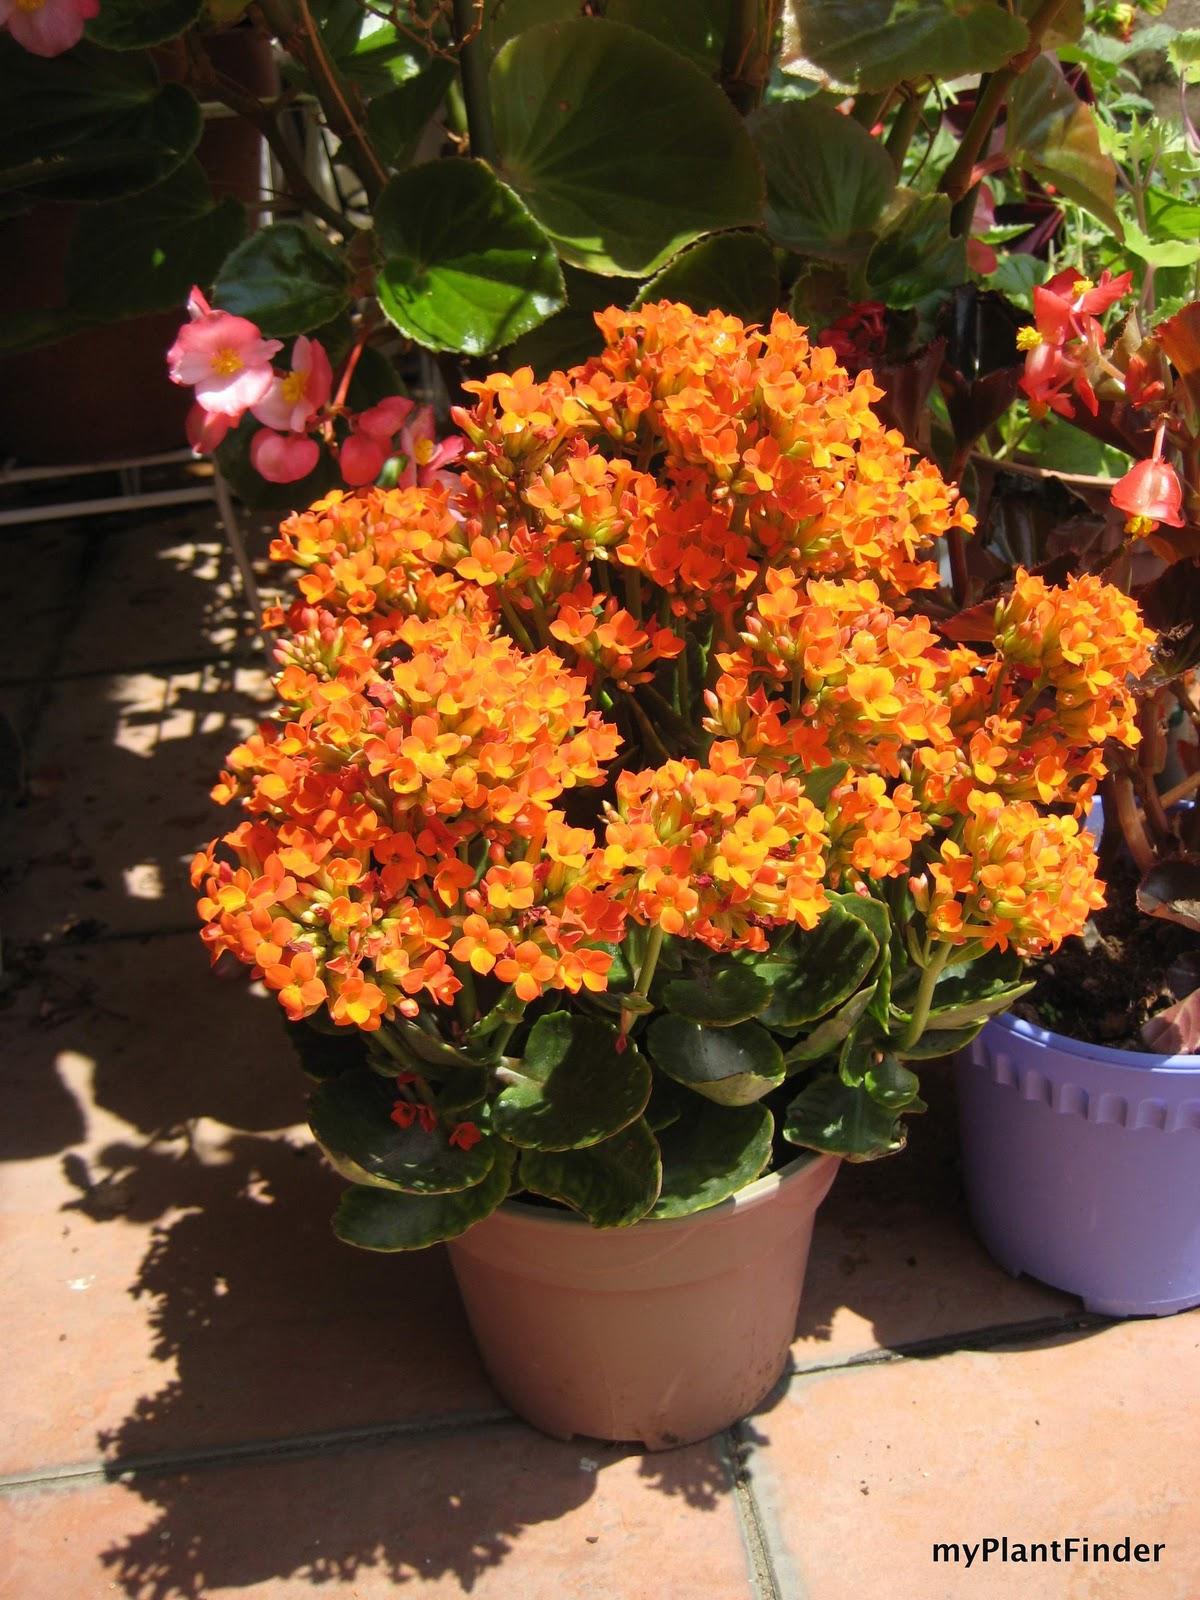 My plant finder plant guide kalanchoe blossfeldiana for Indoor gardening diana yakeley